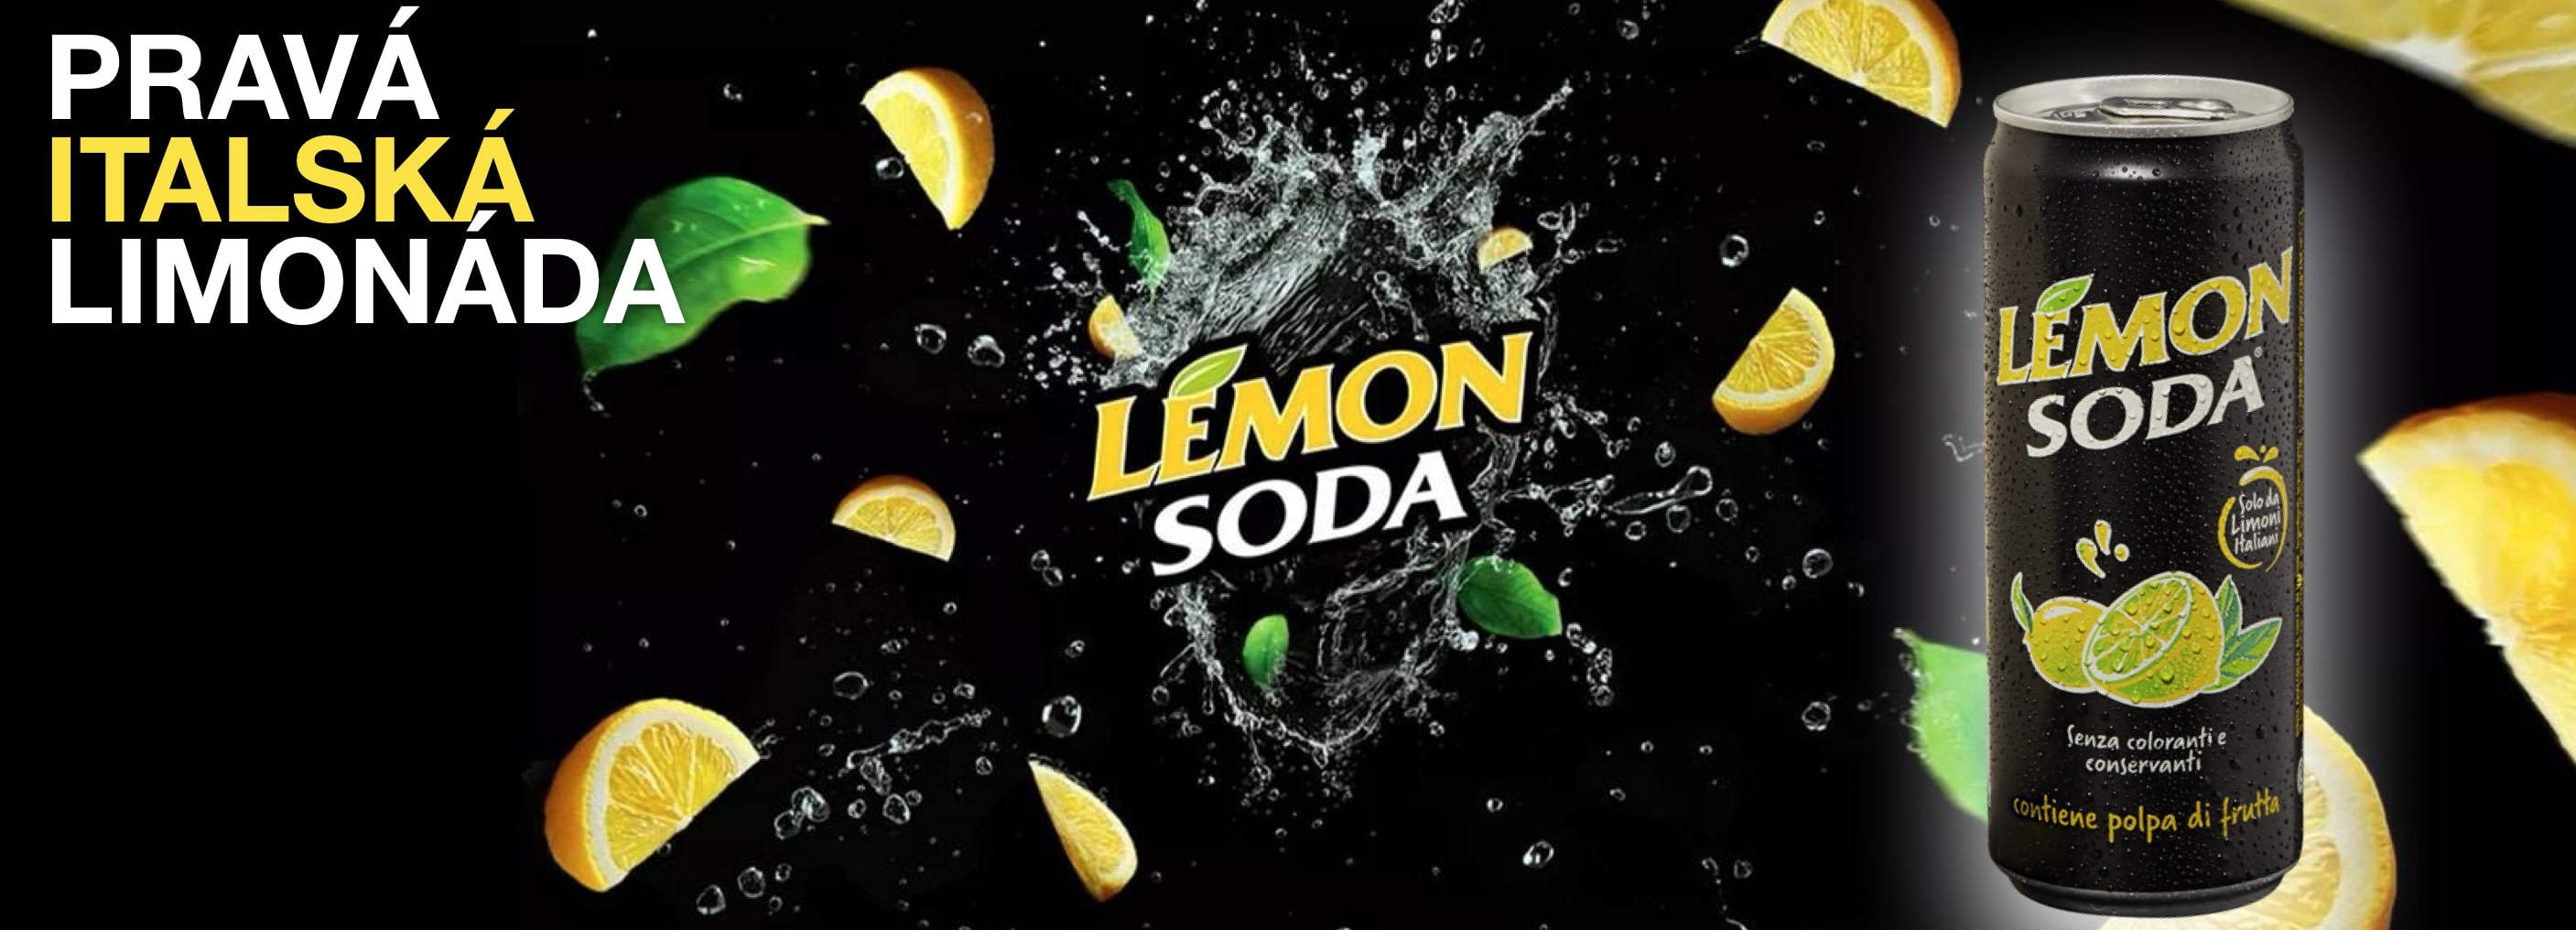 lemonsoda premioveznacky